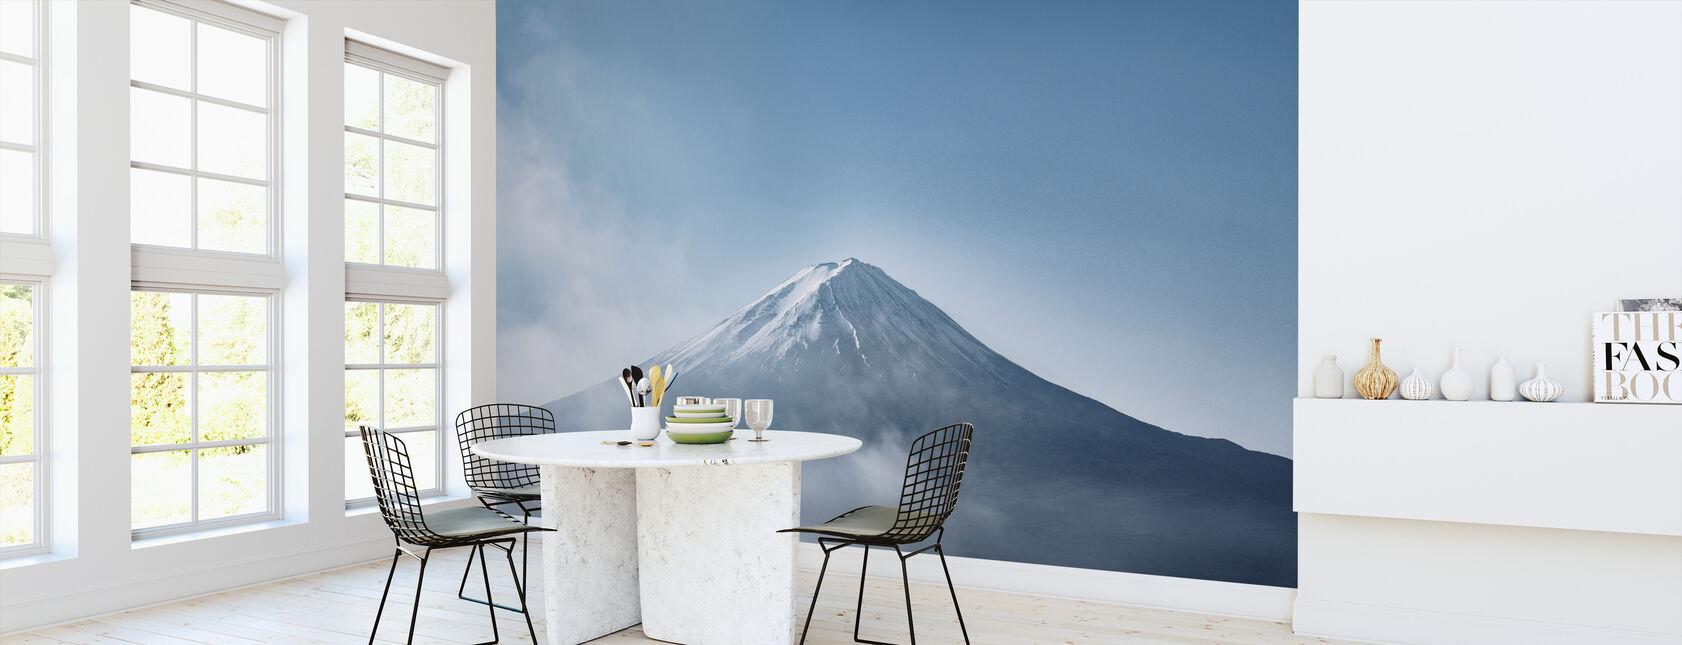 Mount Fuji - Wallpaper - Kitchen